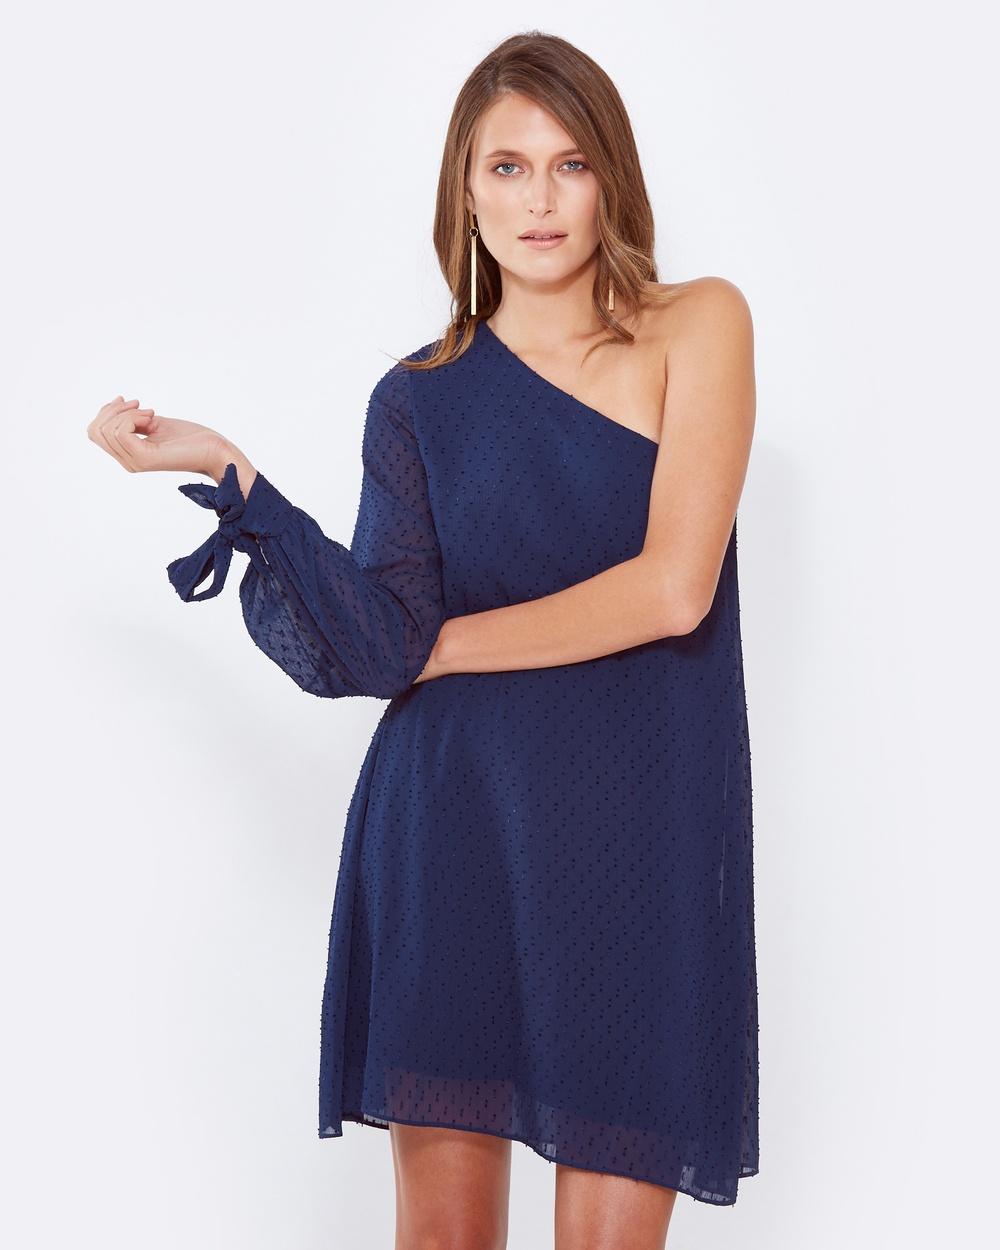 Tussah Yves One Shoulder Dress Dresses Navy Yves One-Shoulder Dress